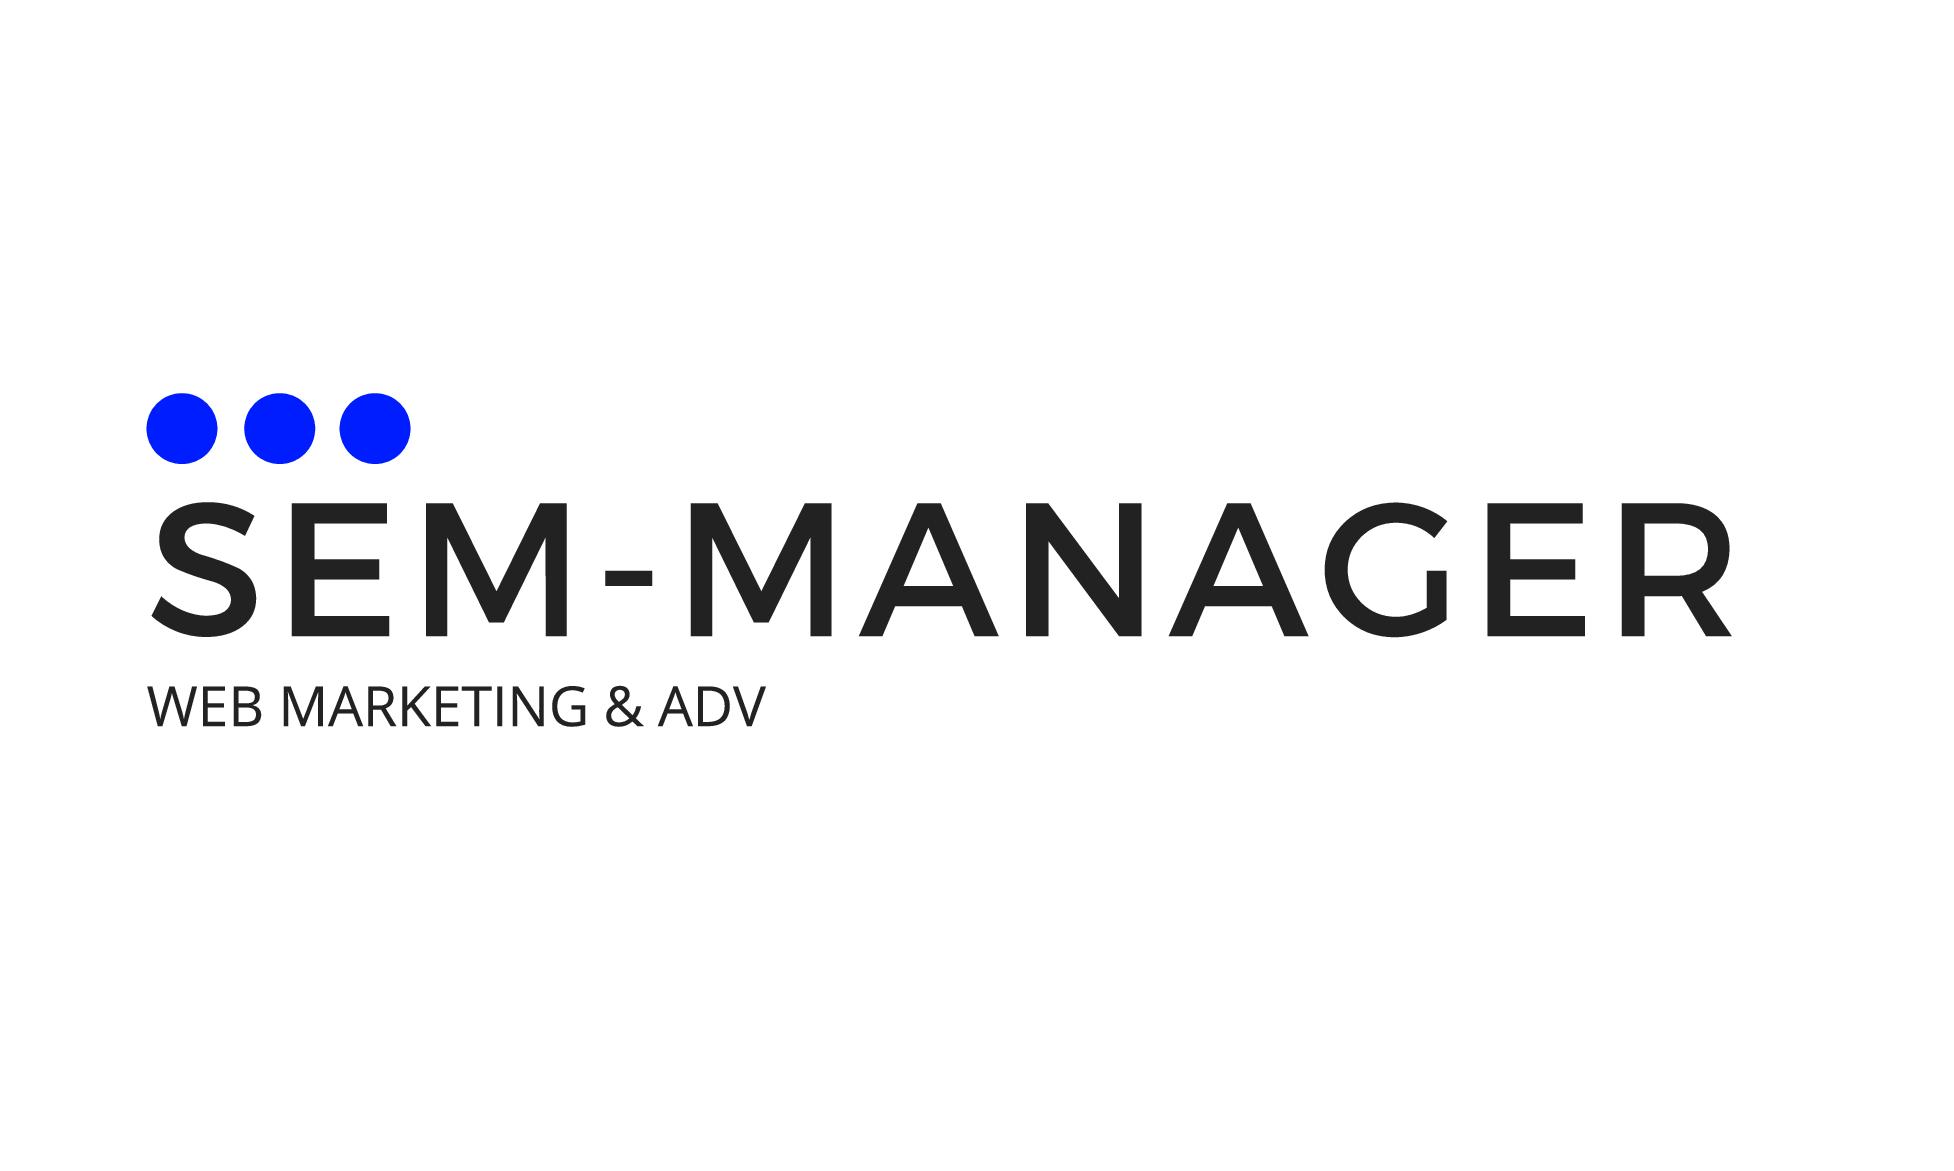 sem manager